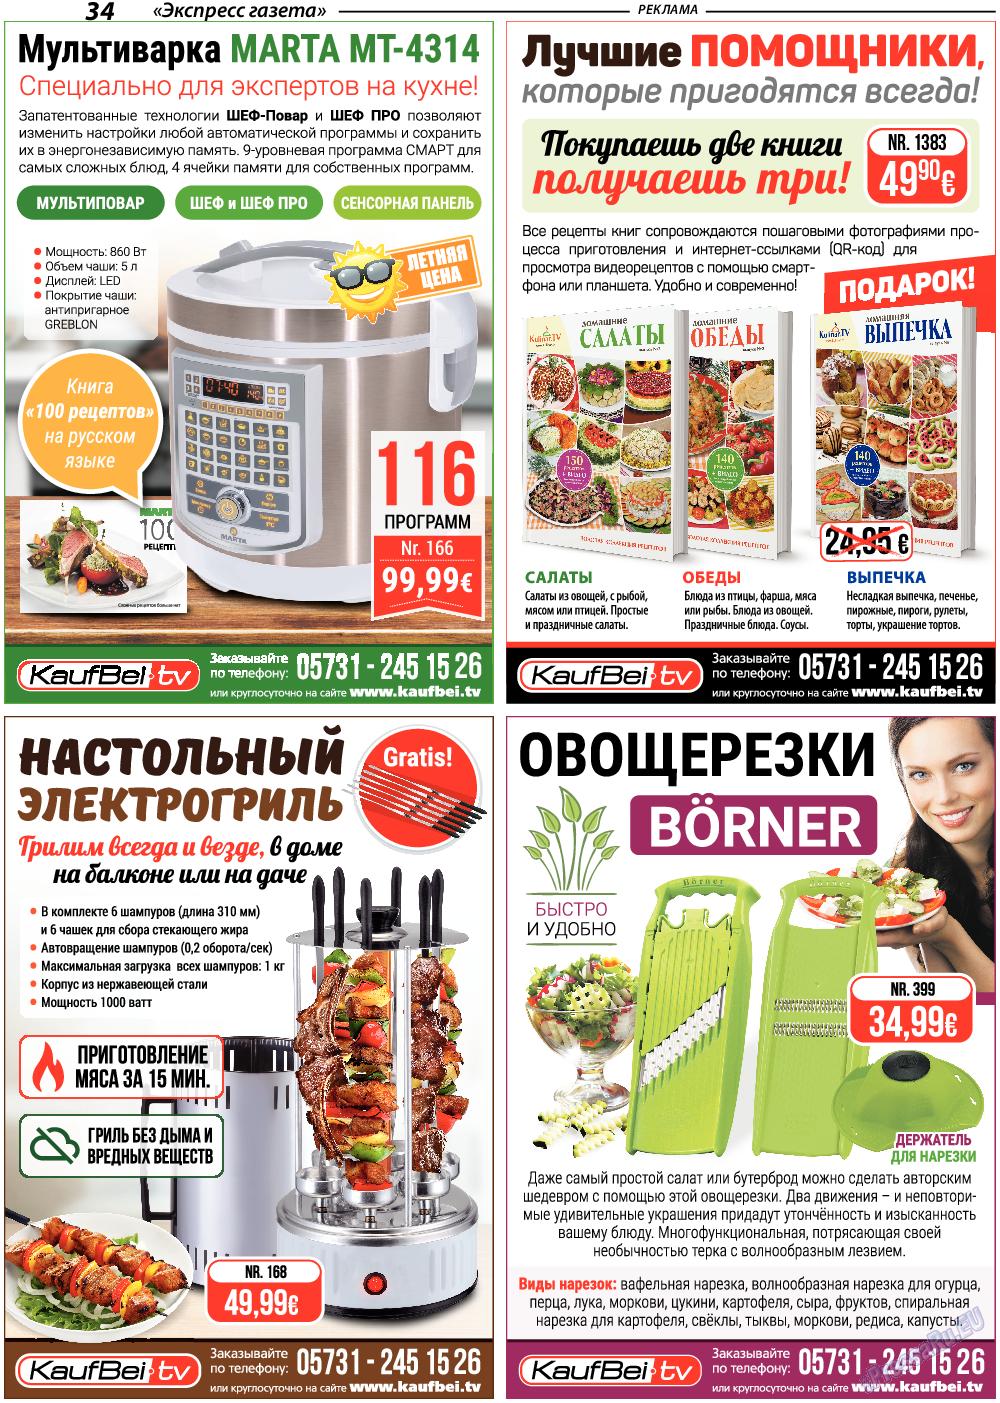 Экспресс газета (газета). 2018 год, номер 10, стр. 34